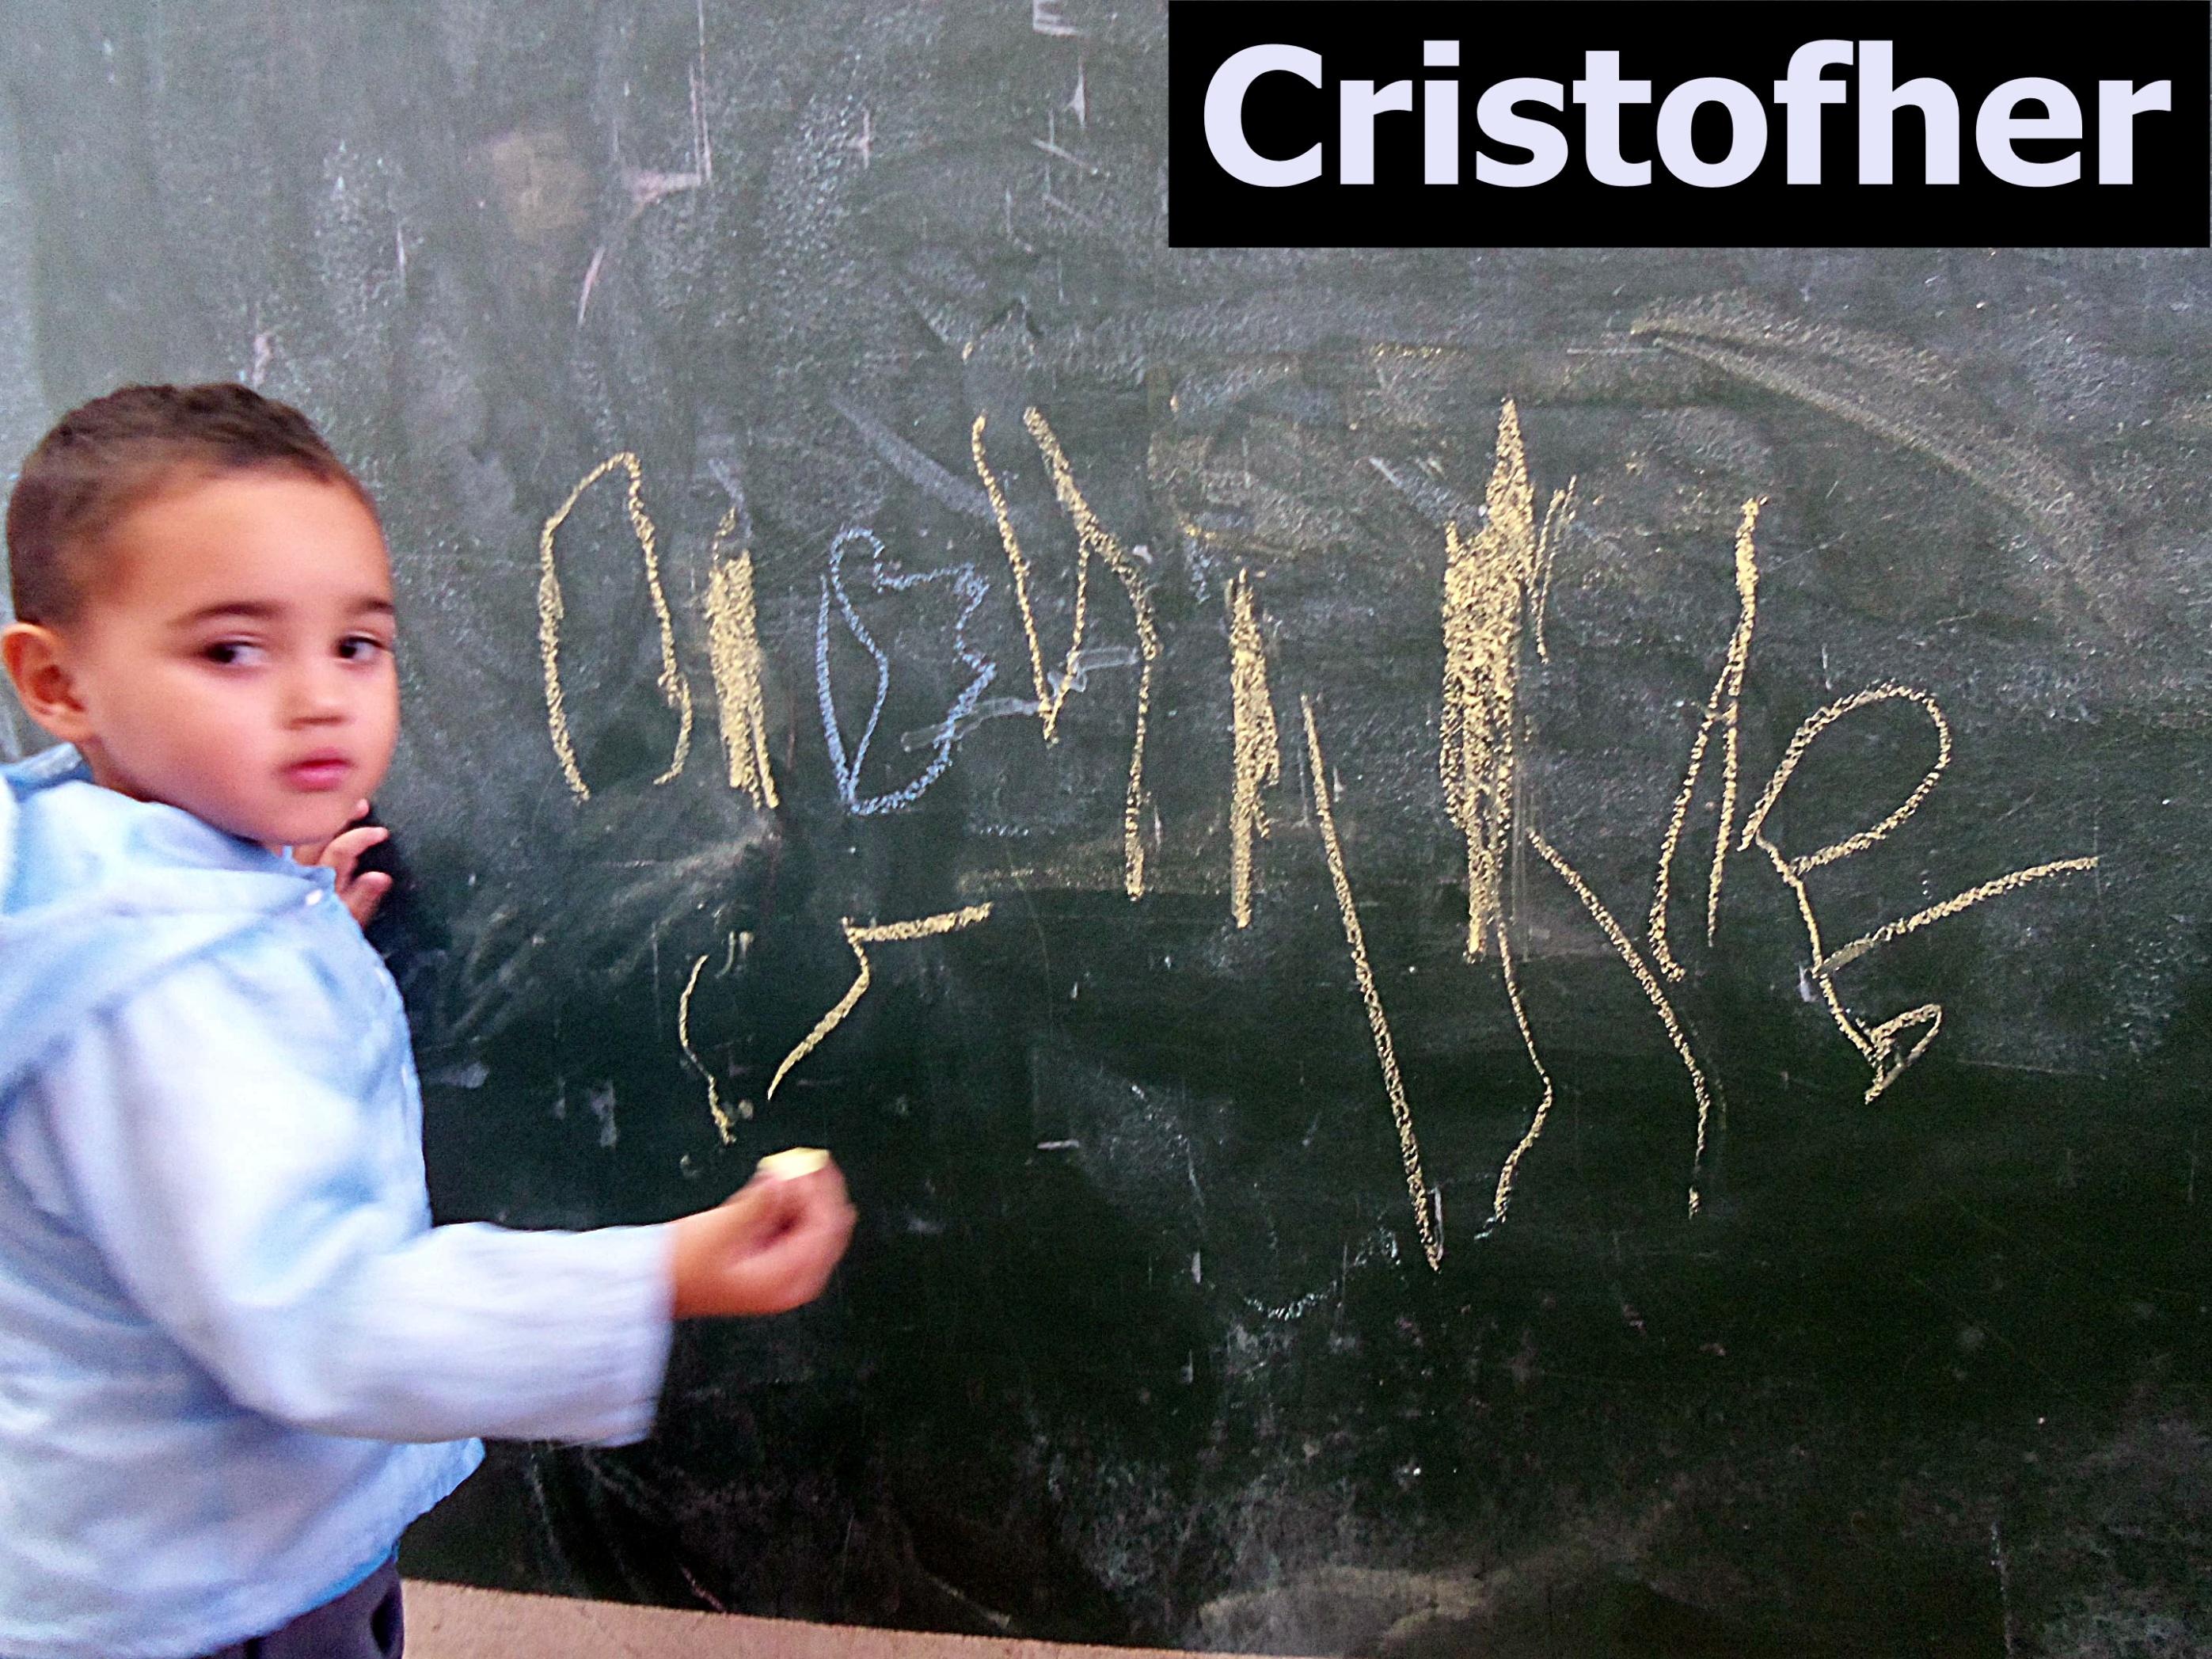 Cristofher